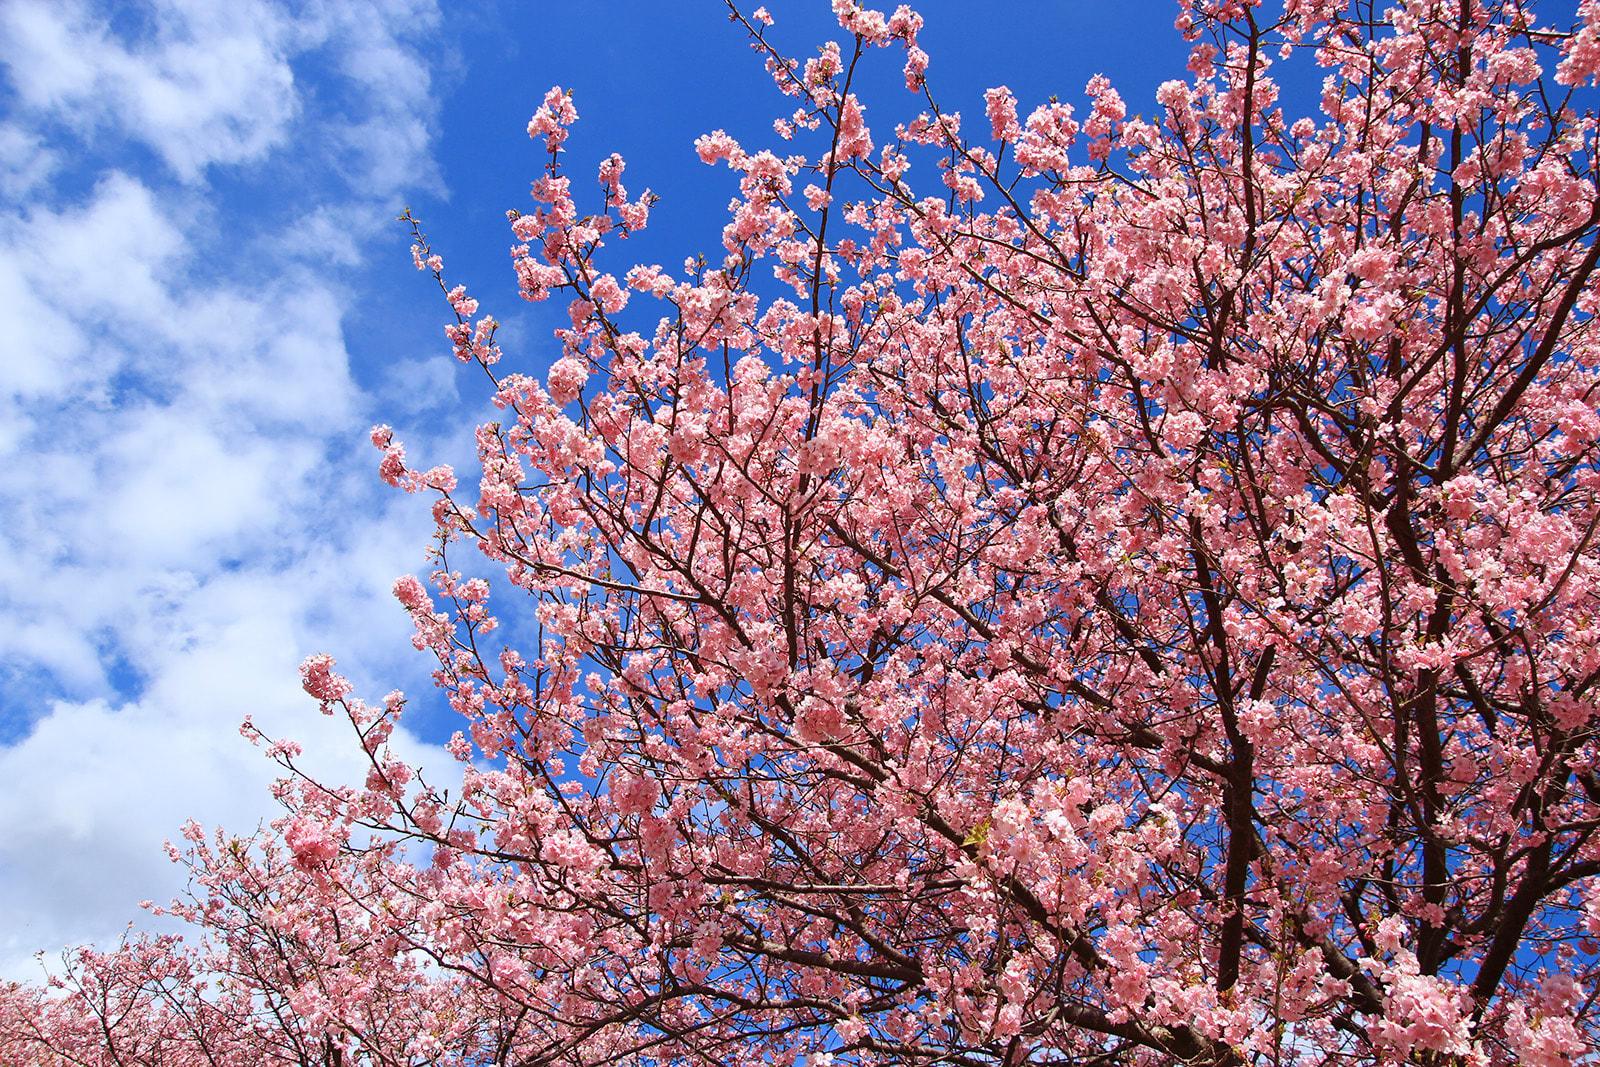 Ngắm Kawazu-zakura và trời sao tại Miurakaigan, Kanazawa-ken 3